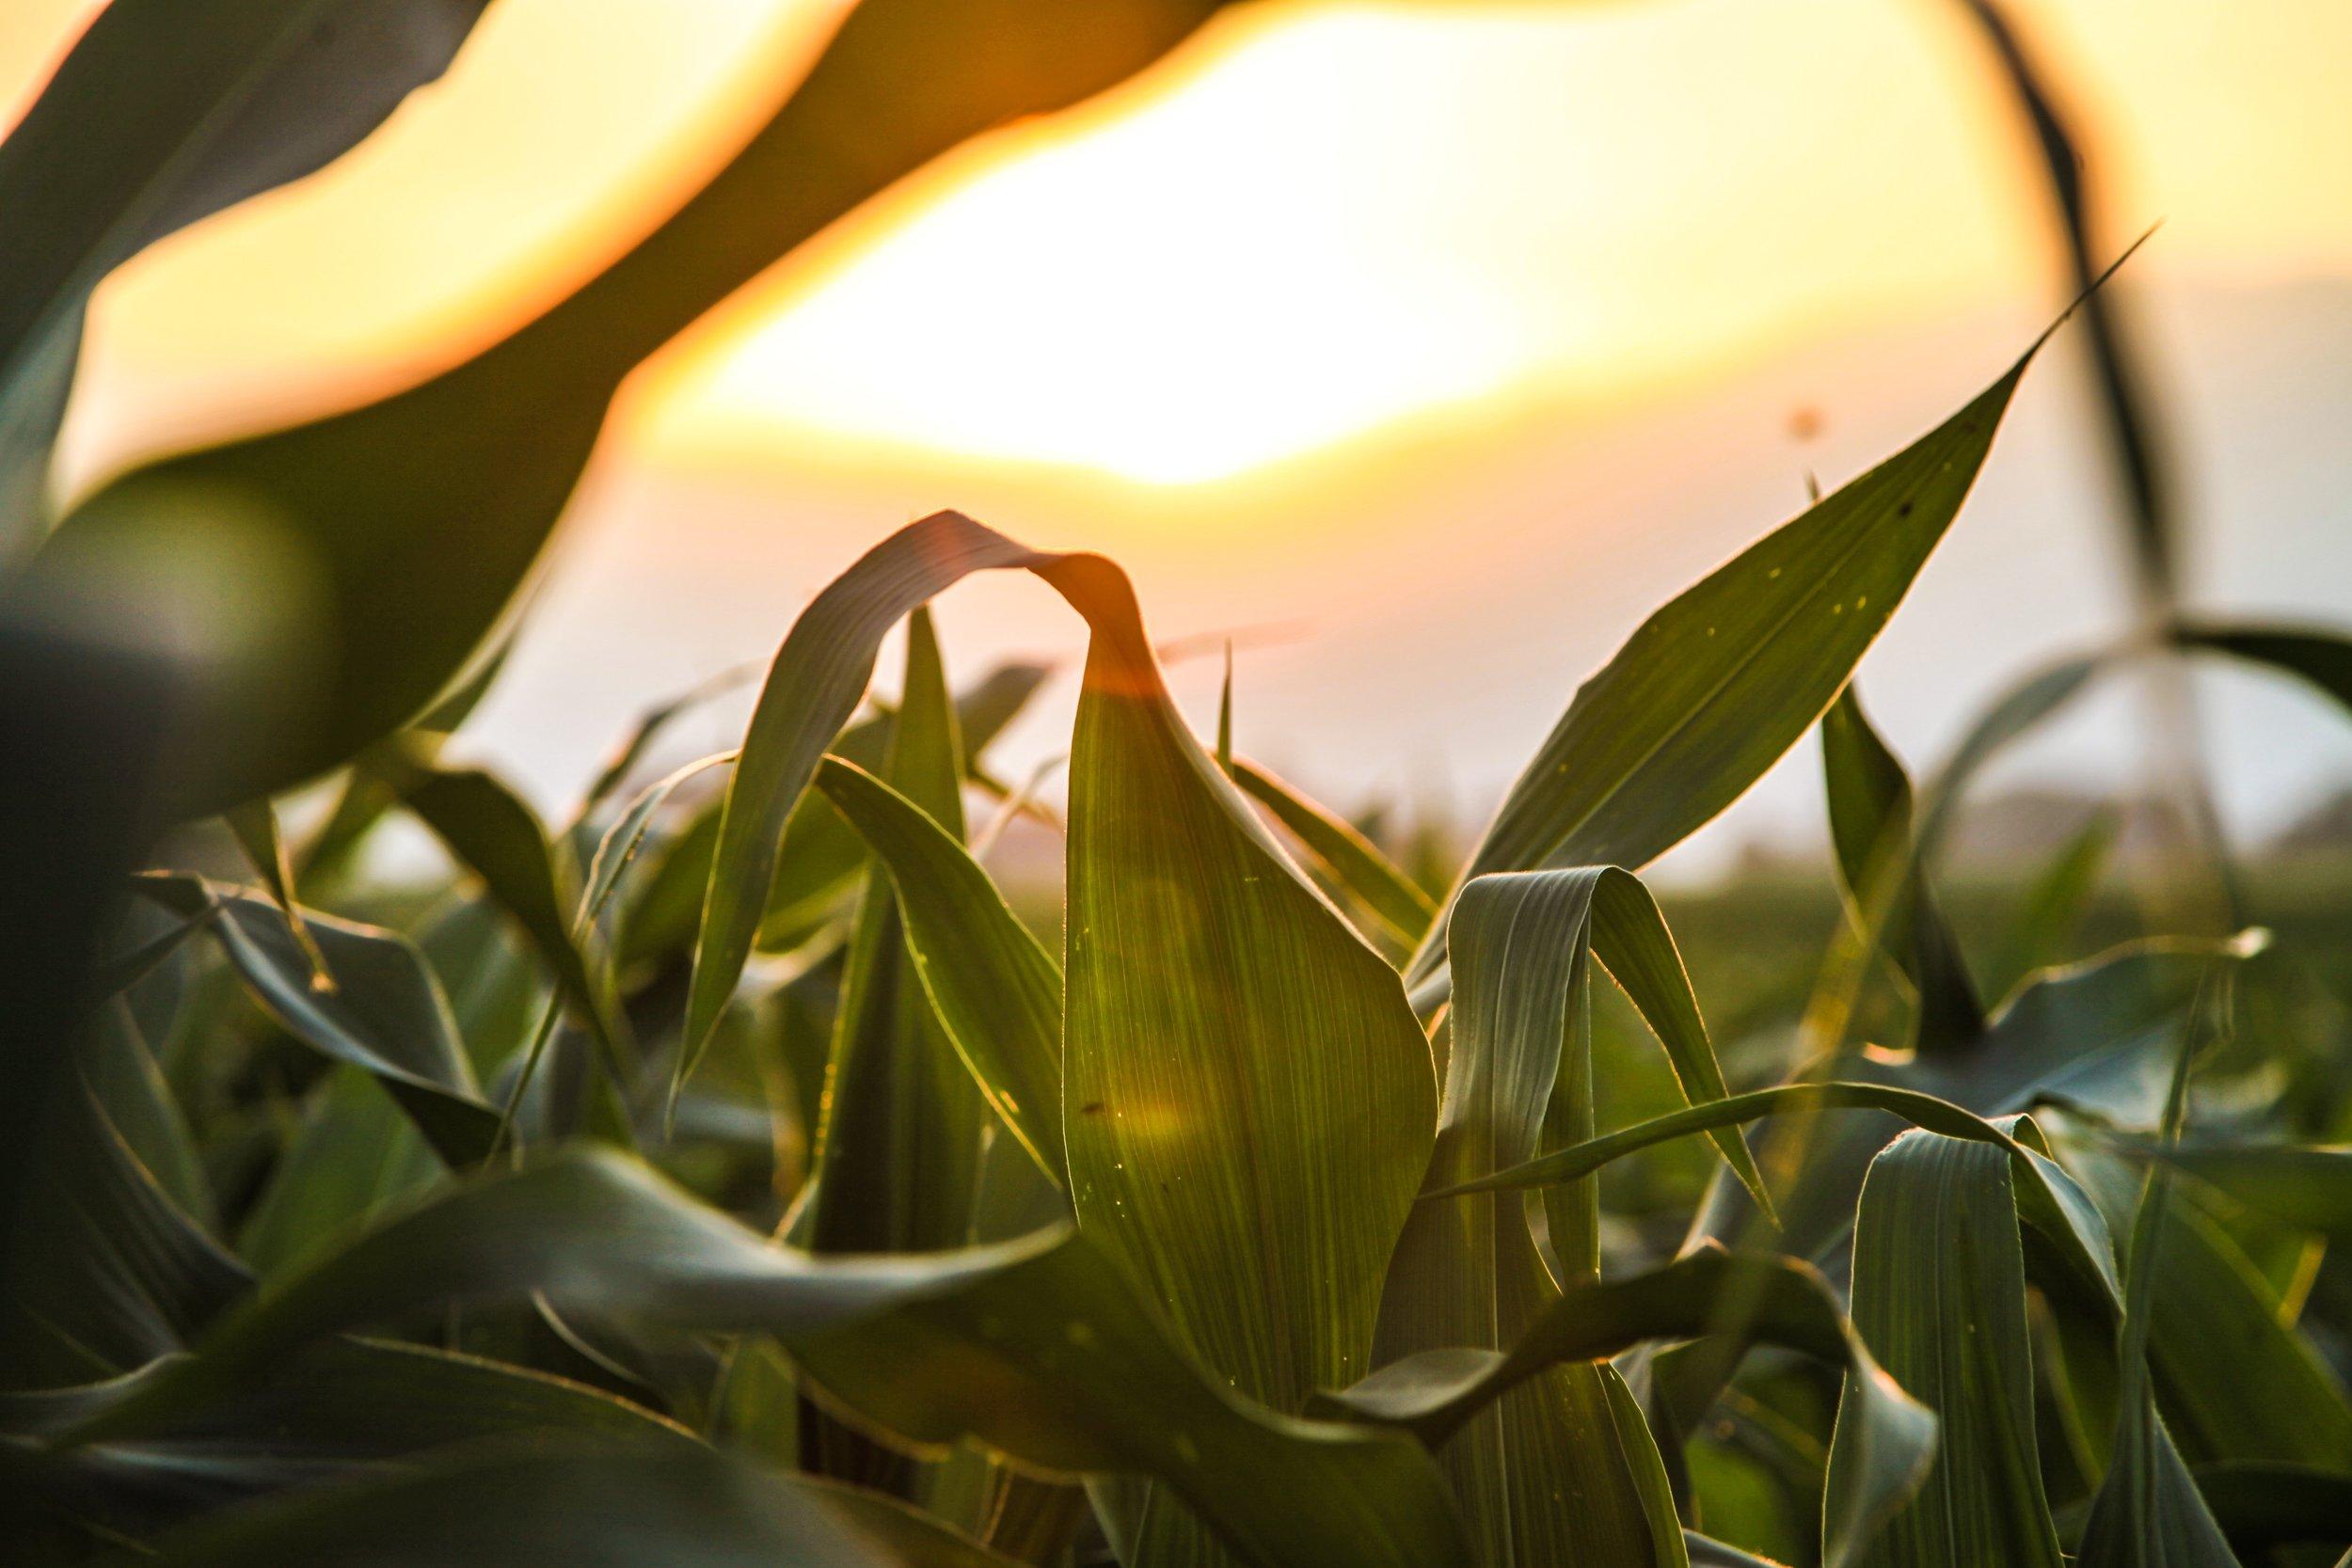 Grain profits with blockchain   Farmtario  27 November 2018